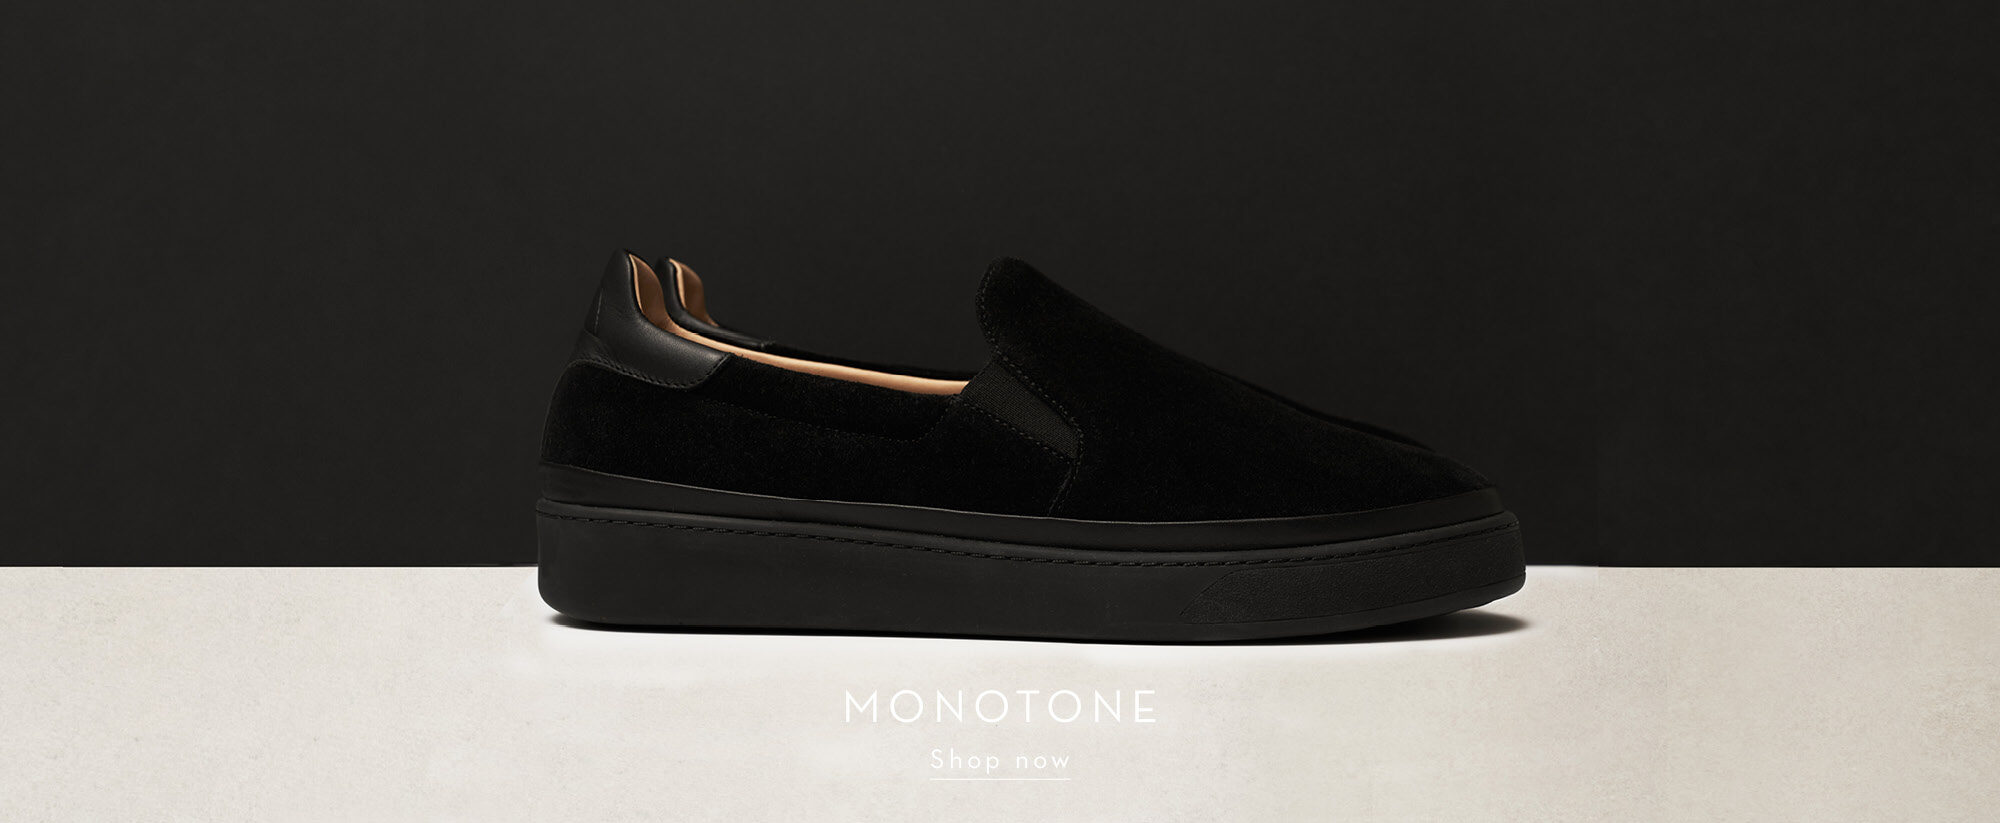 Monotone Mens Shoes - Black Slip-on Mens Sneakers